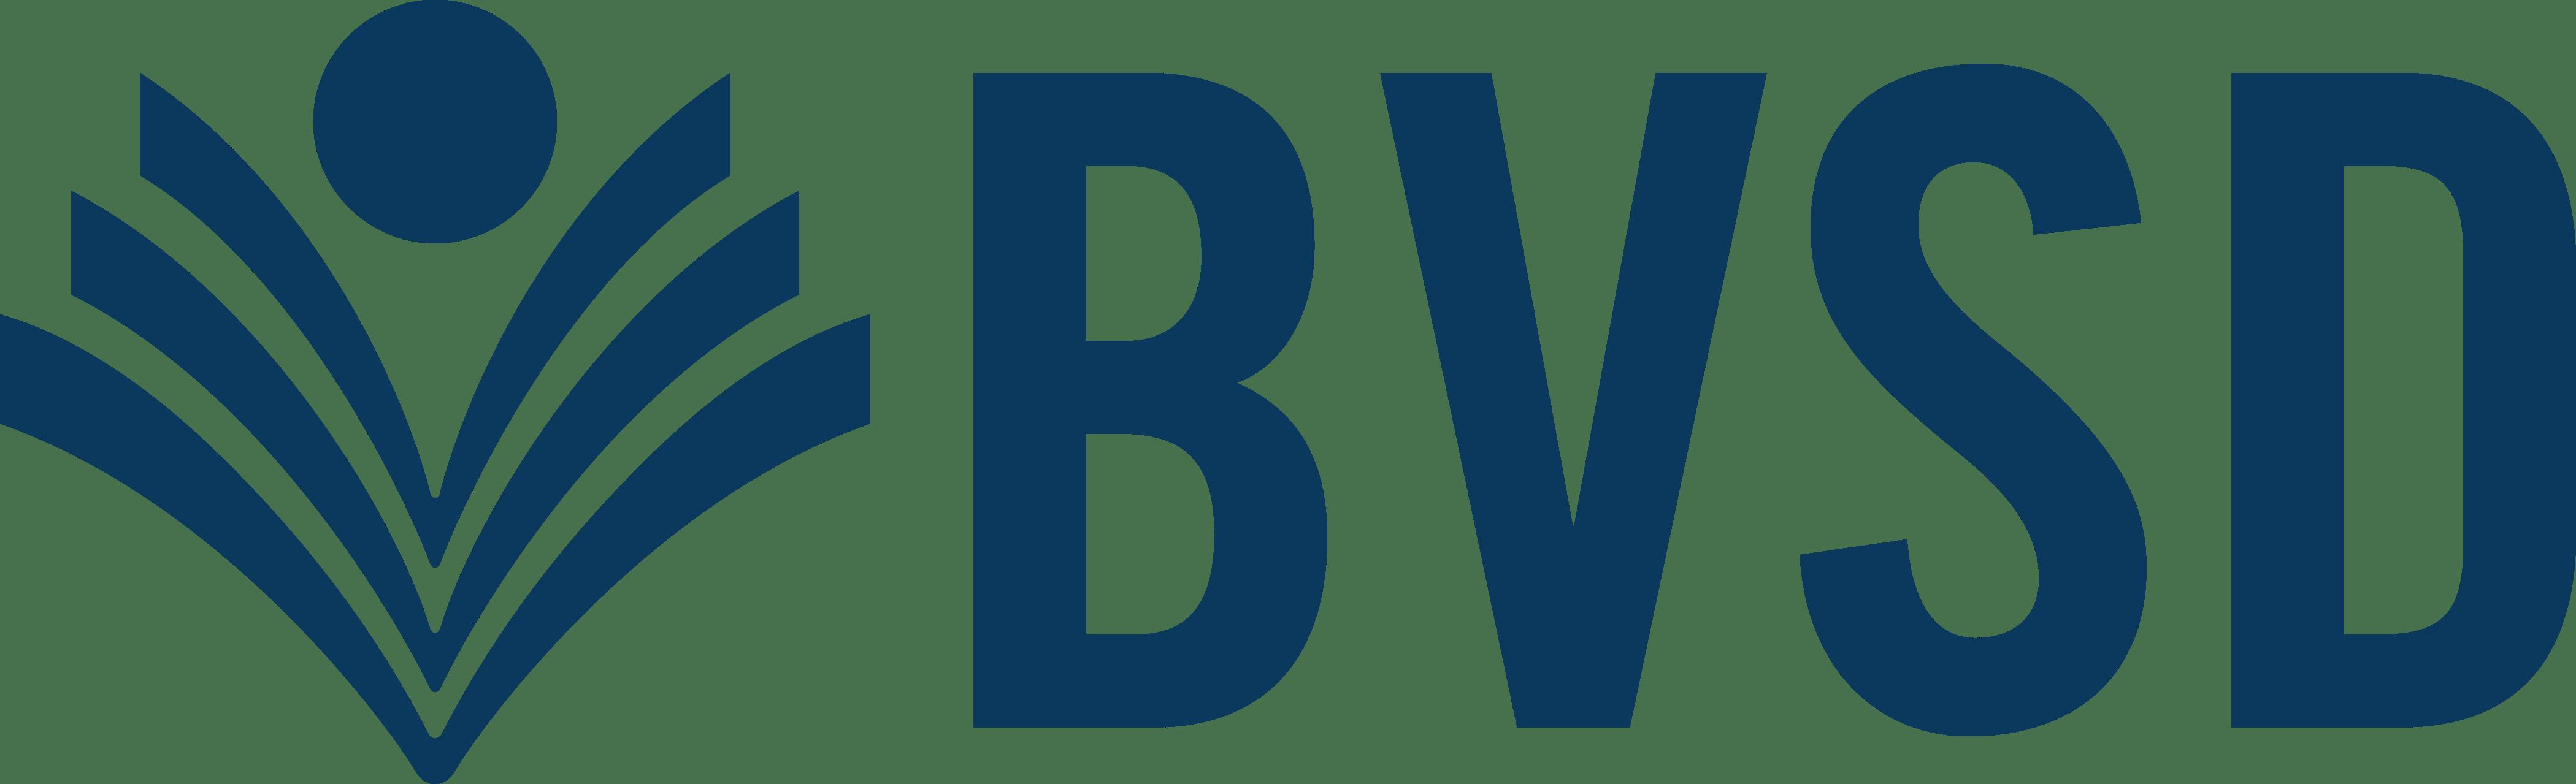 Let's Talk BVSD